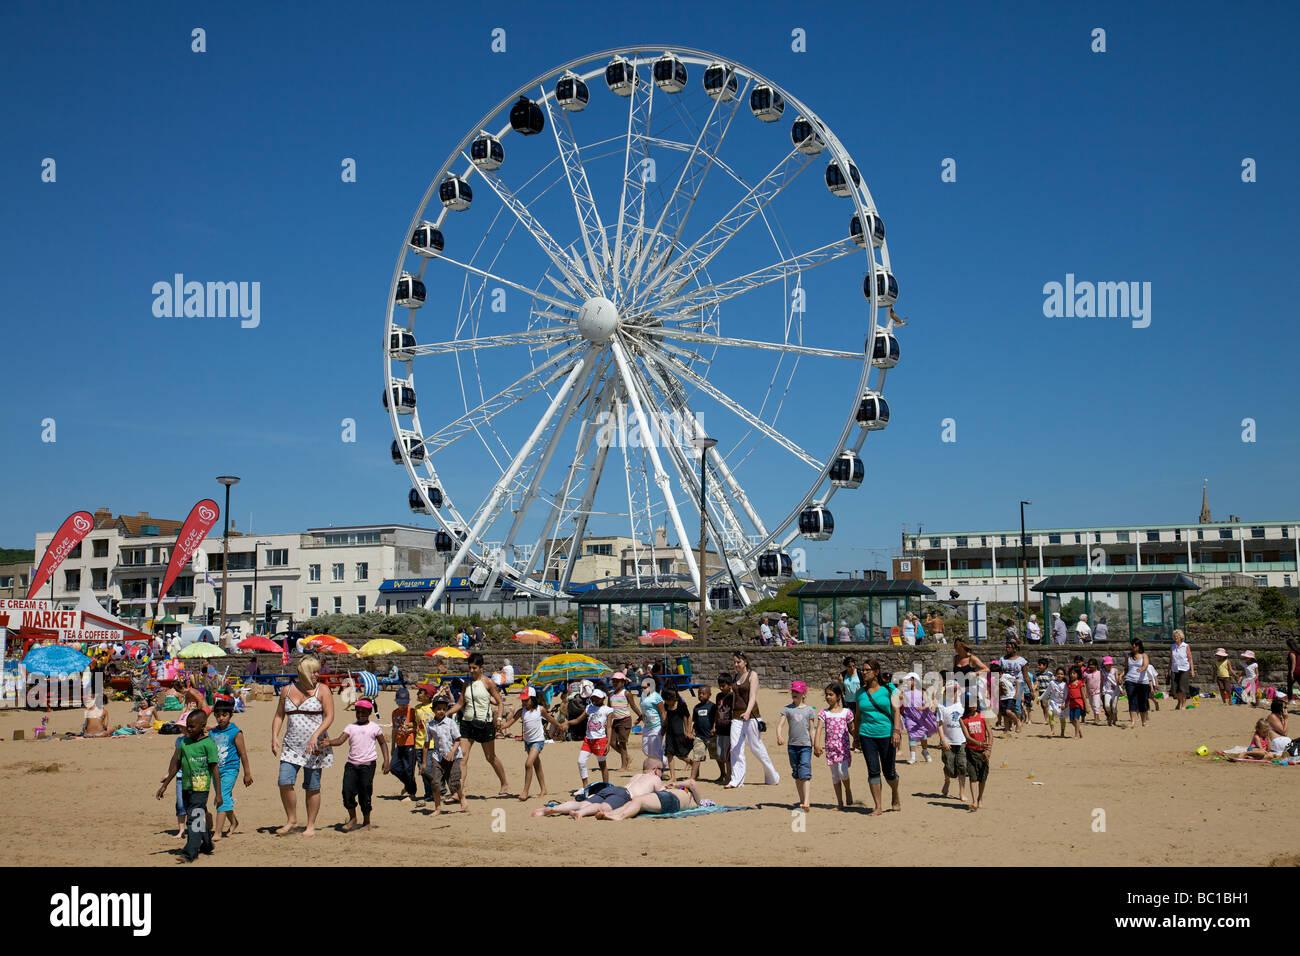 Childern on Weston Super Mare beach - Stock Image